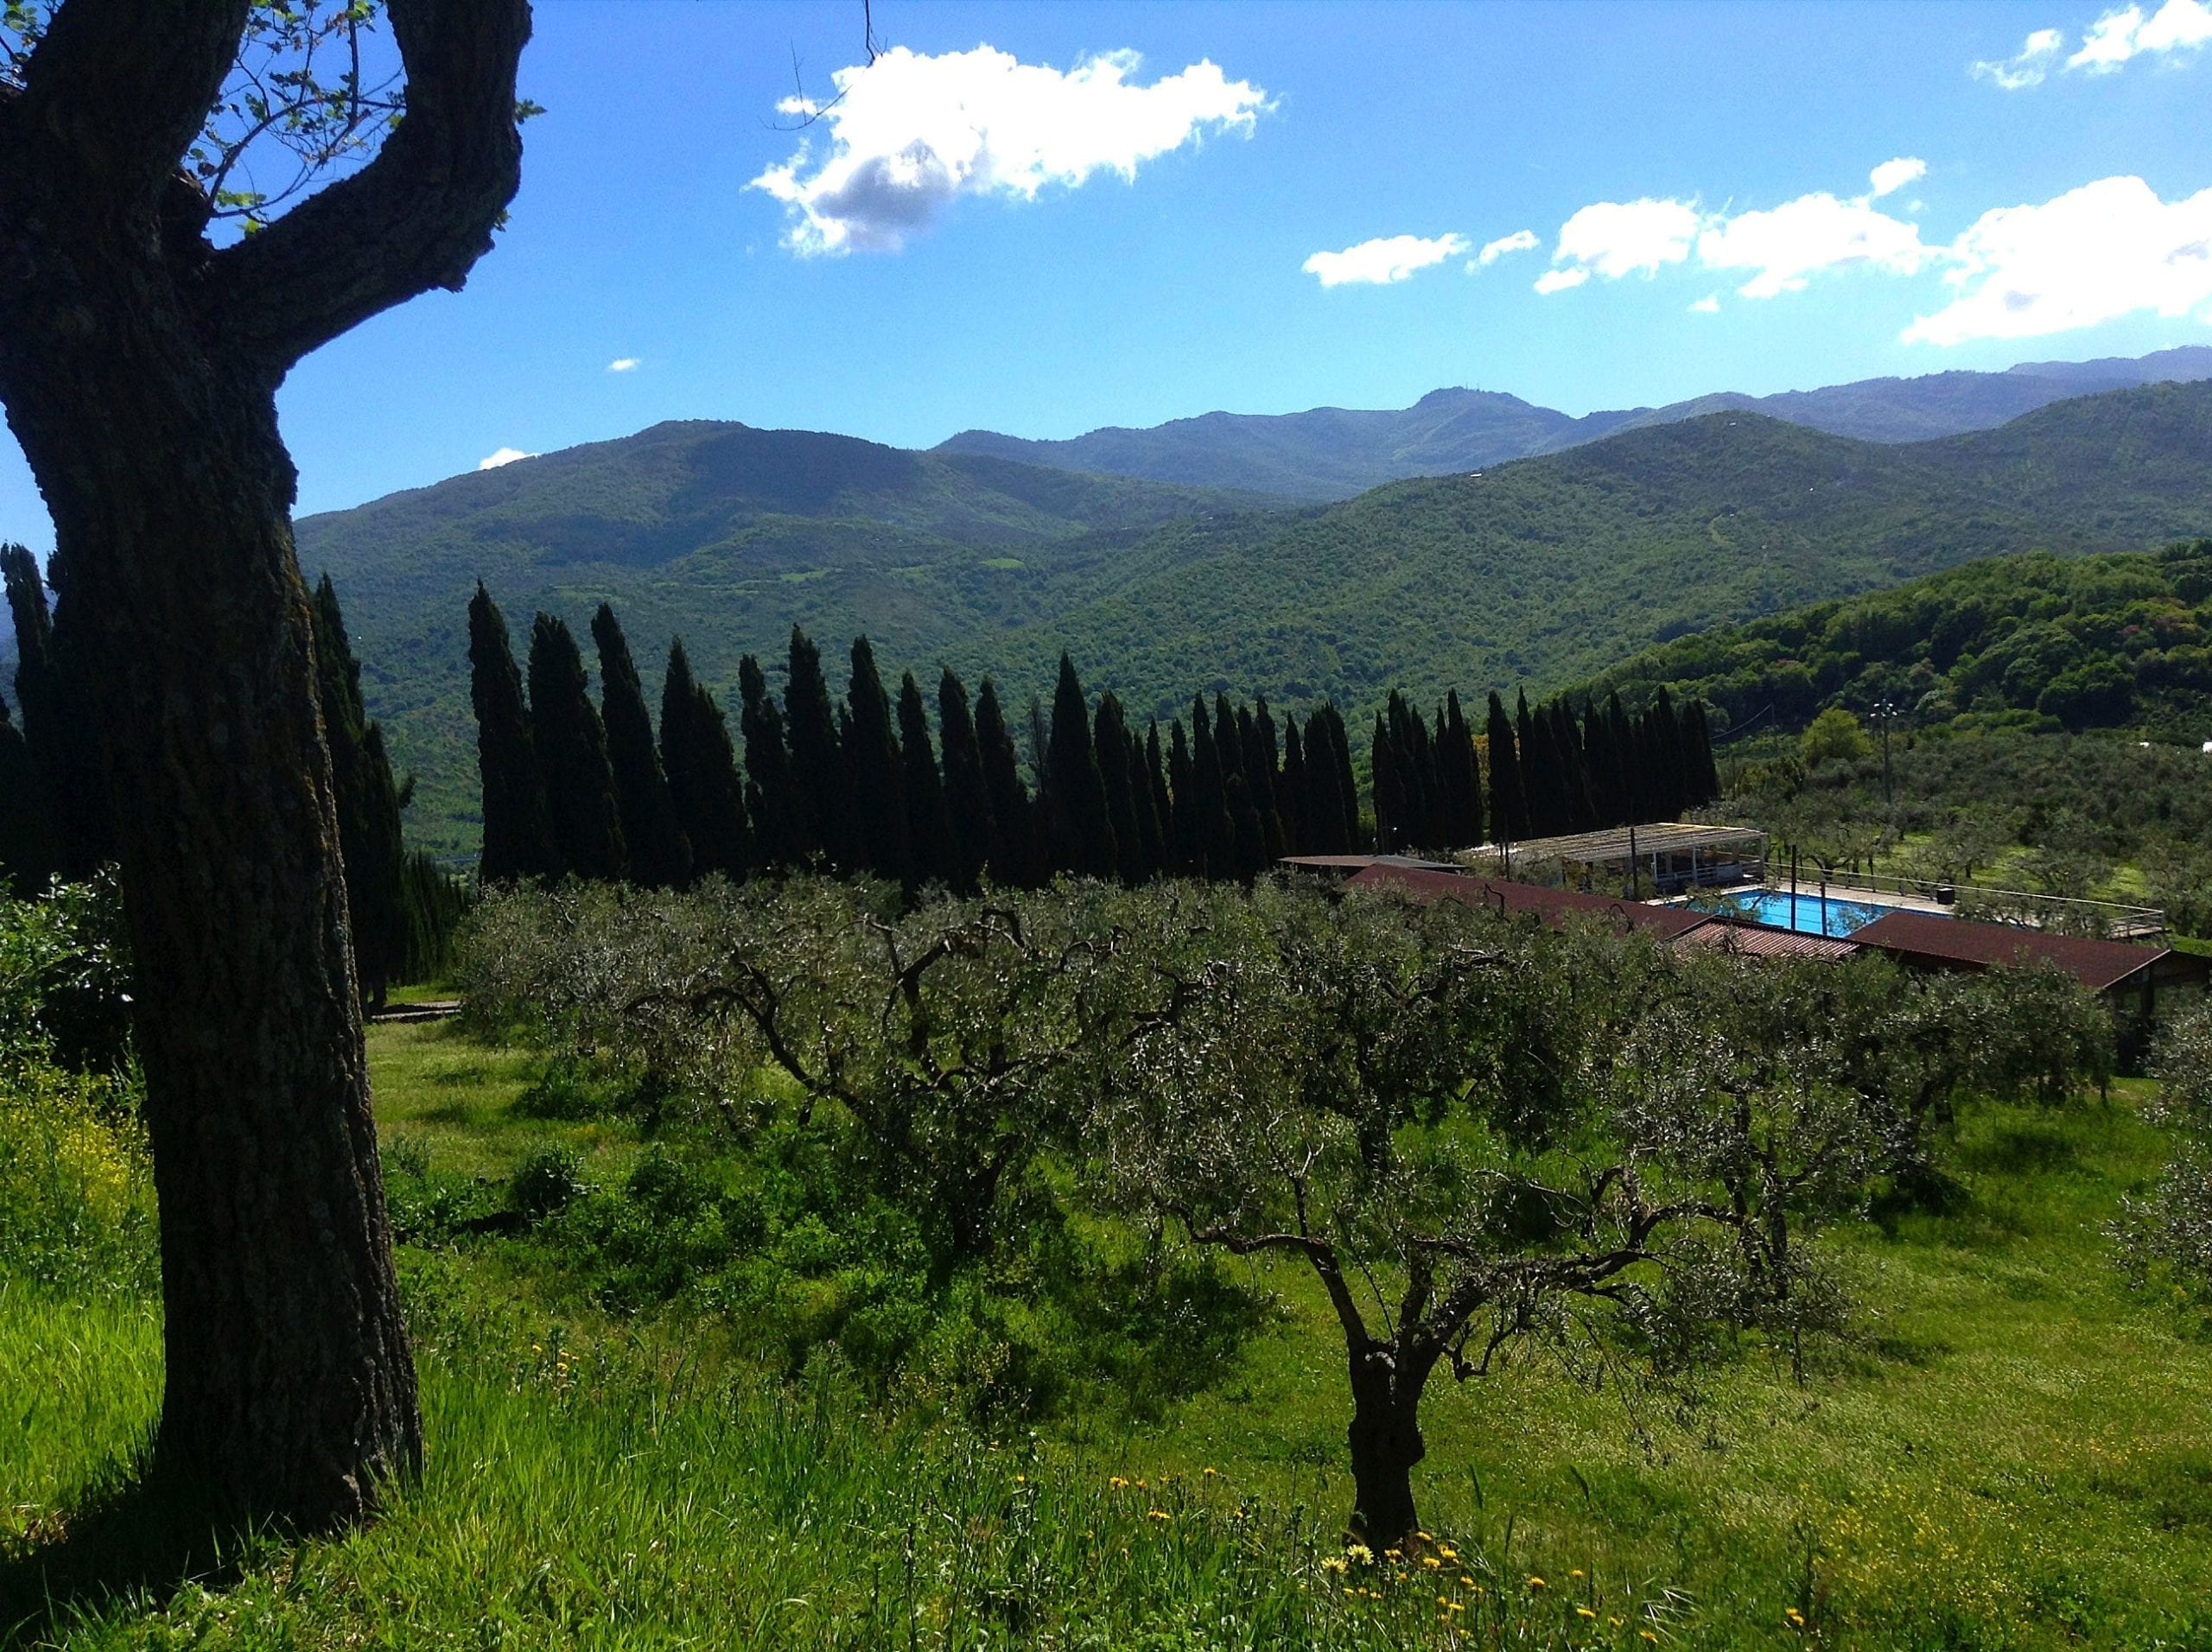 Views at Agriturismo La Cerra Tivoli